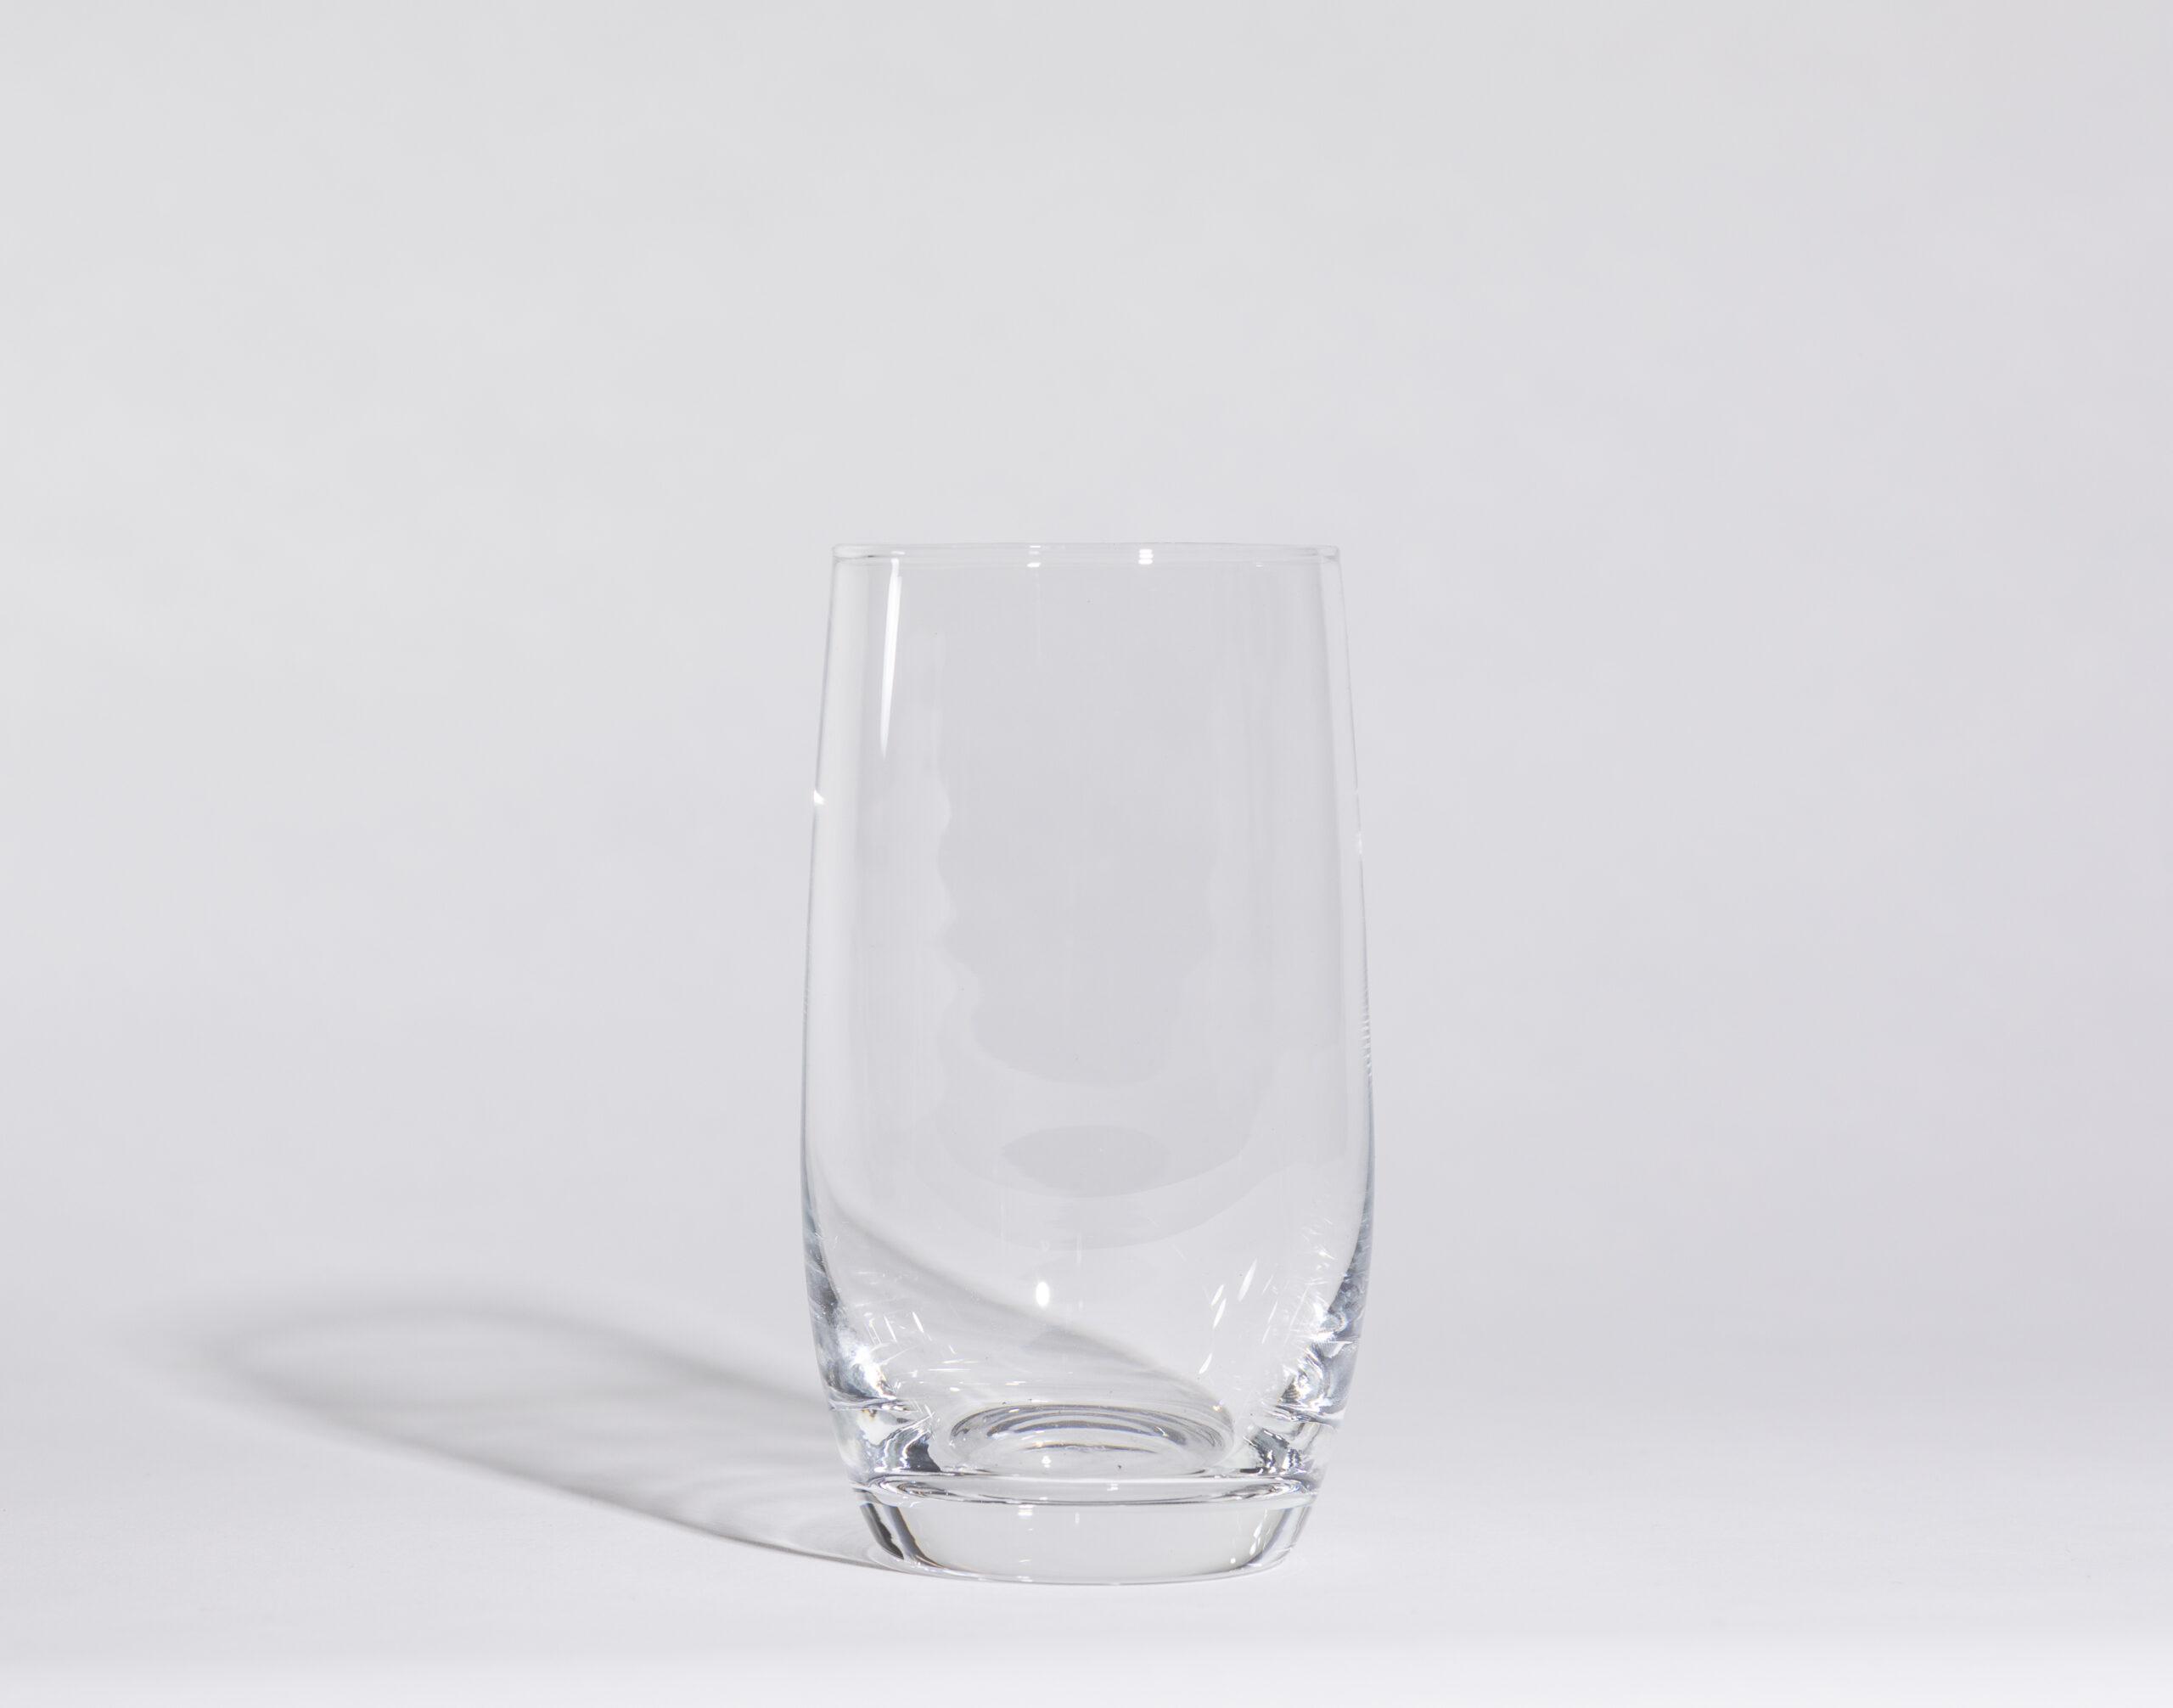 Juice glasses (11oz)